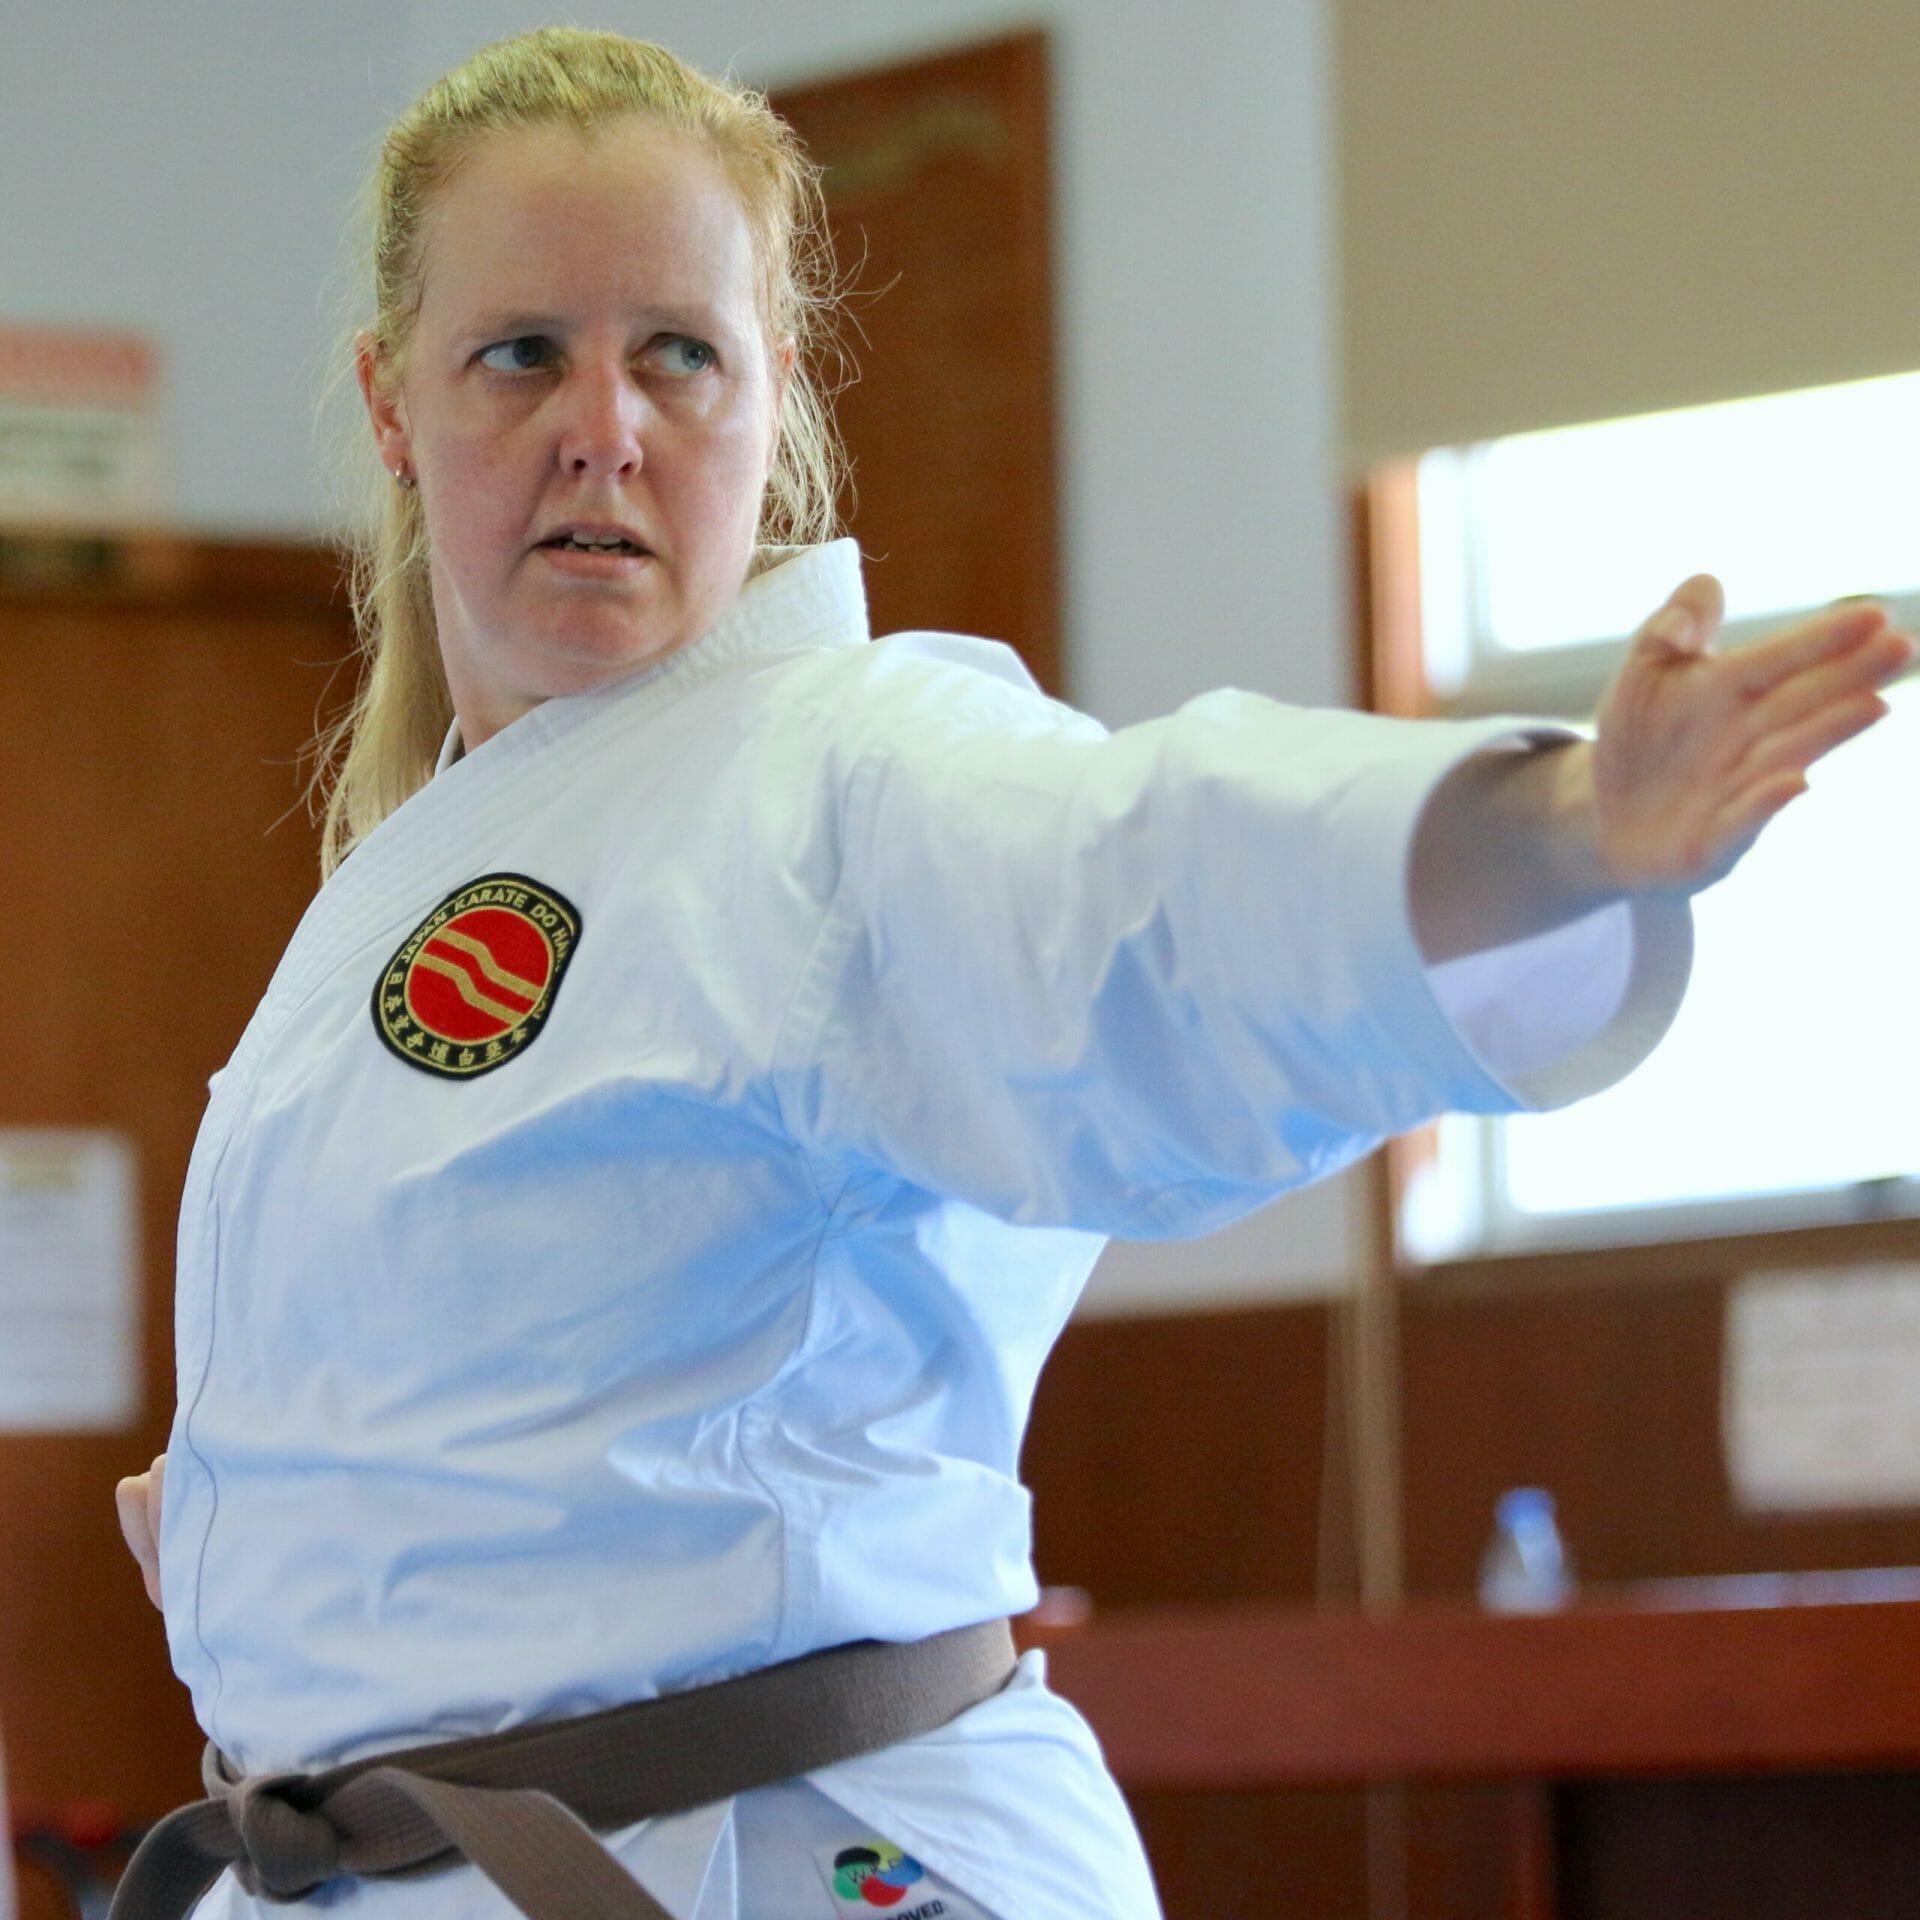 Adult karate student doing kata at the Gold Coast Dojo